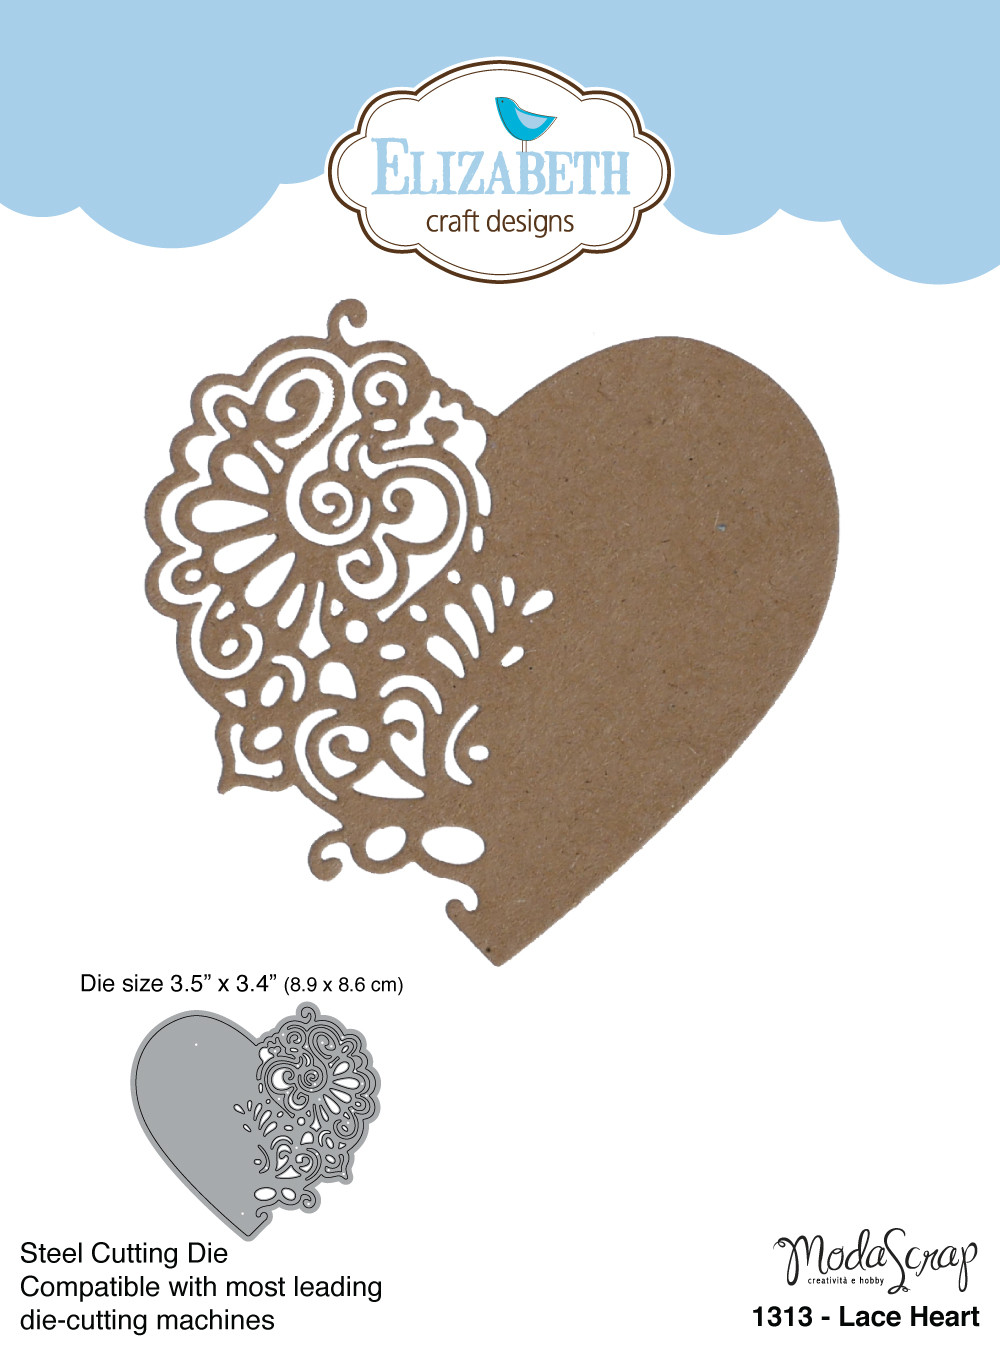 Elizabeth Craft Designs Die Lace Heart By Modascrap